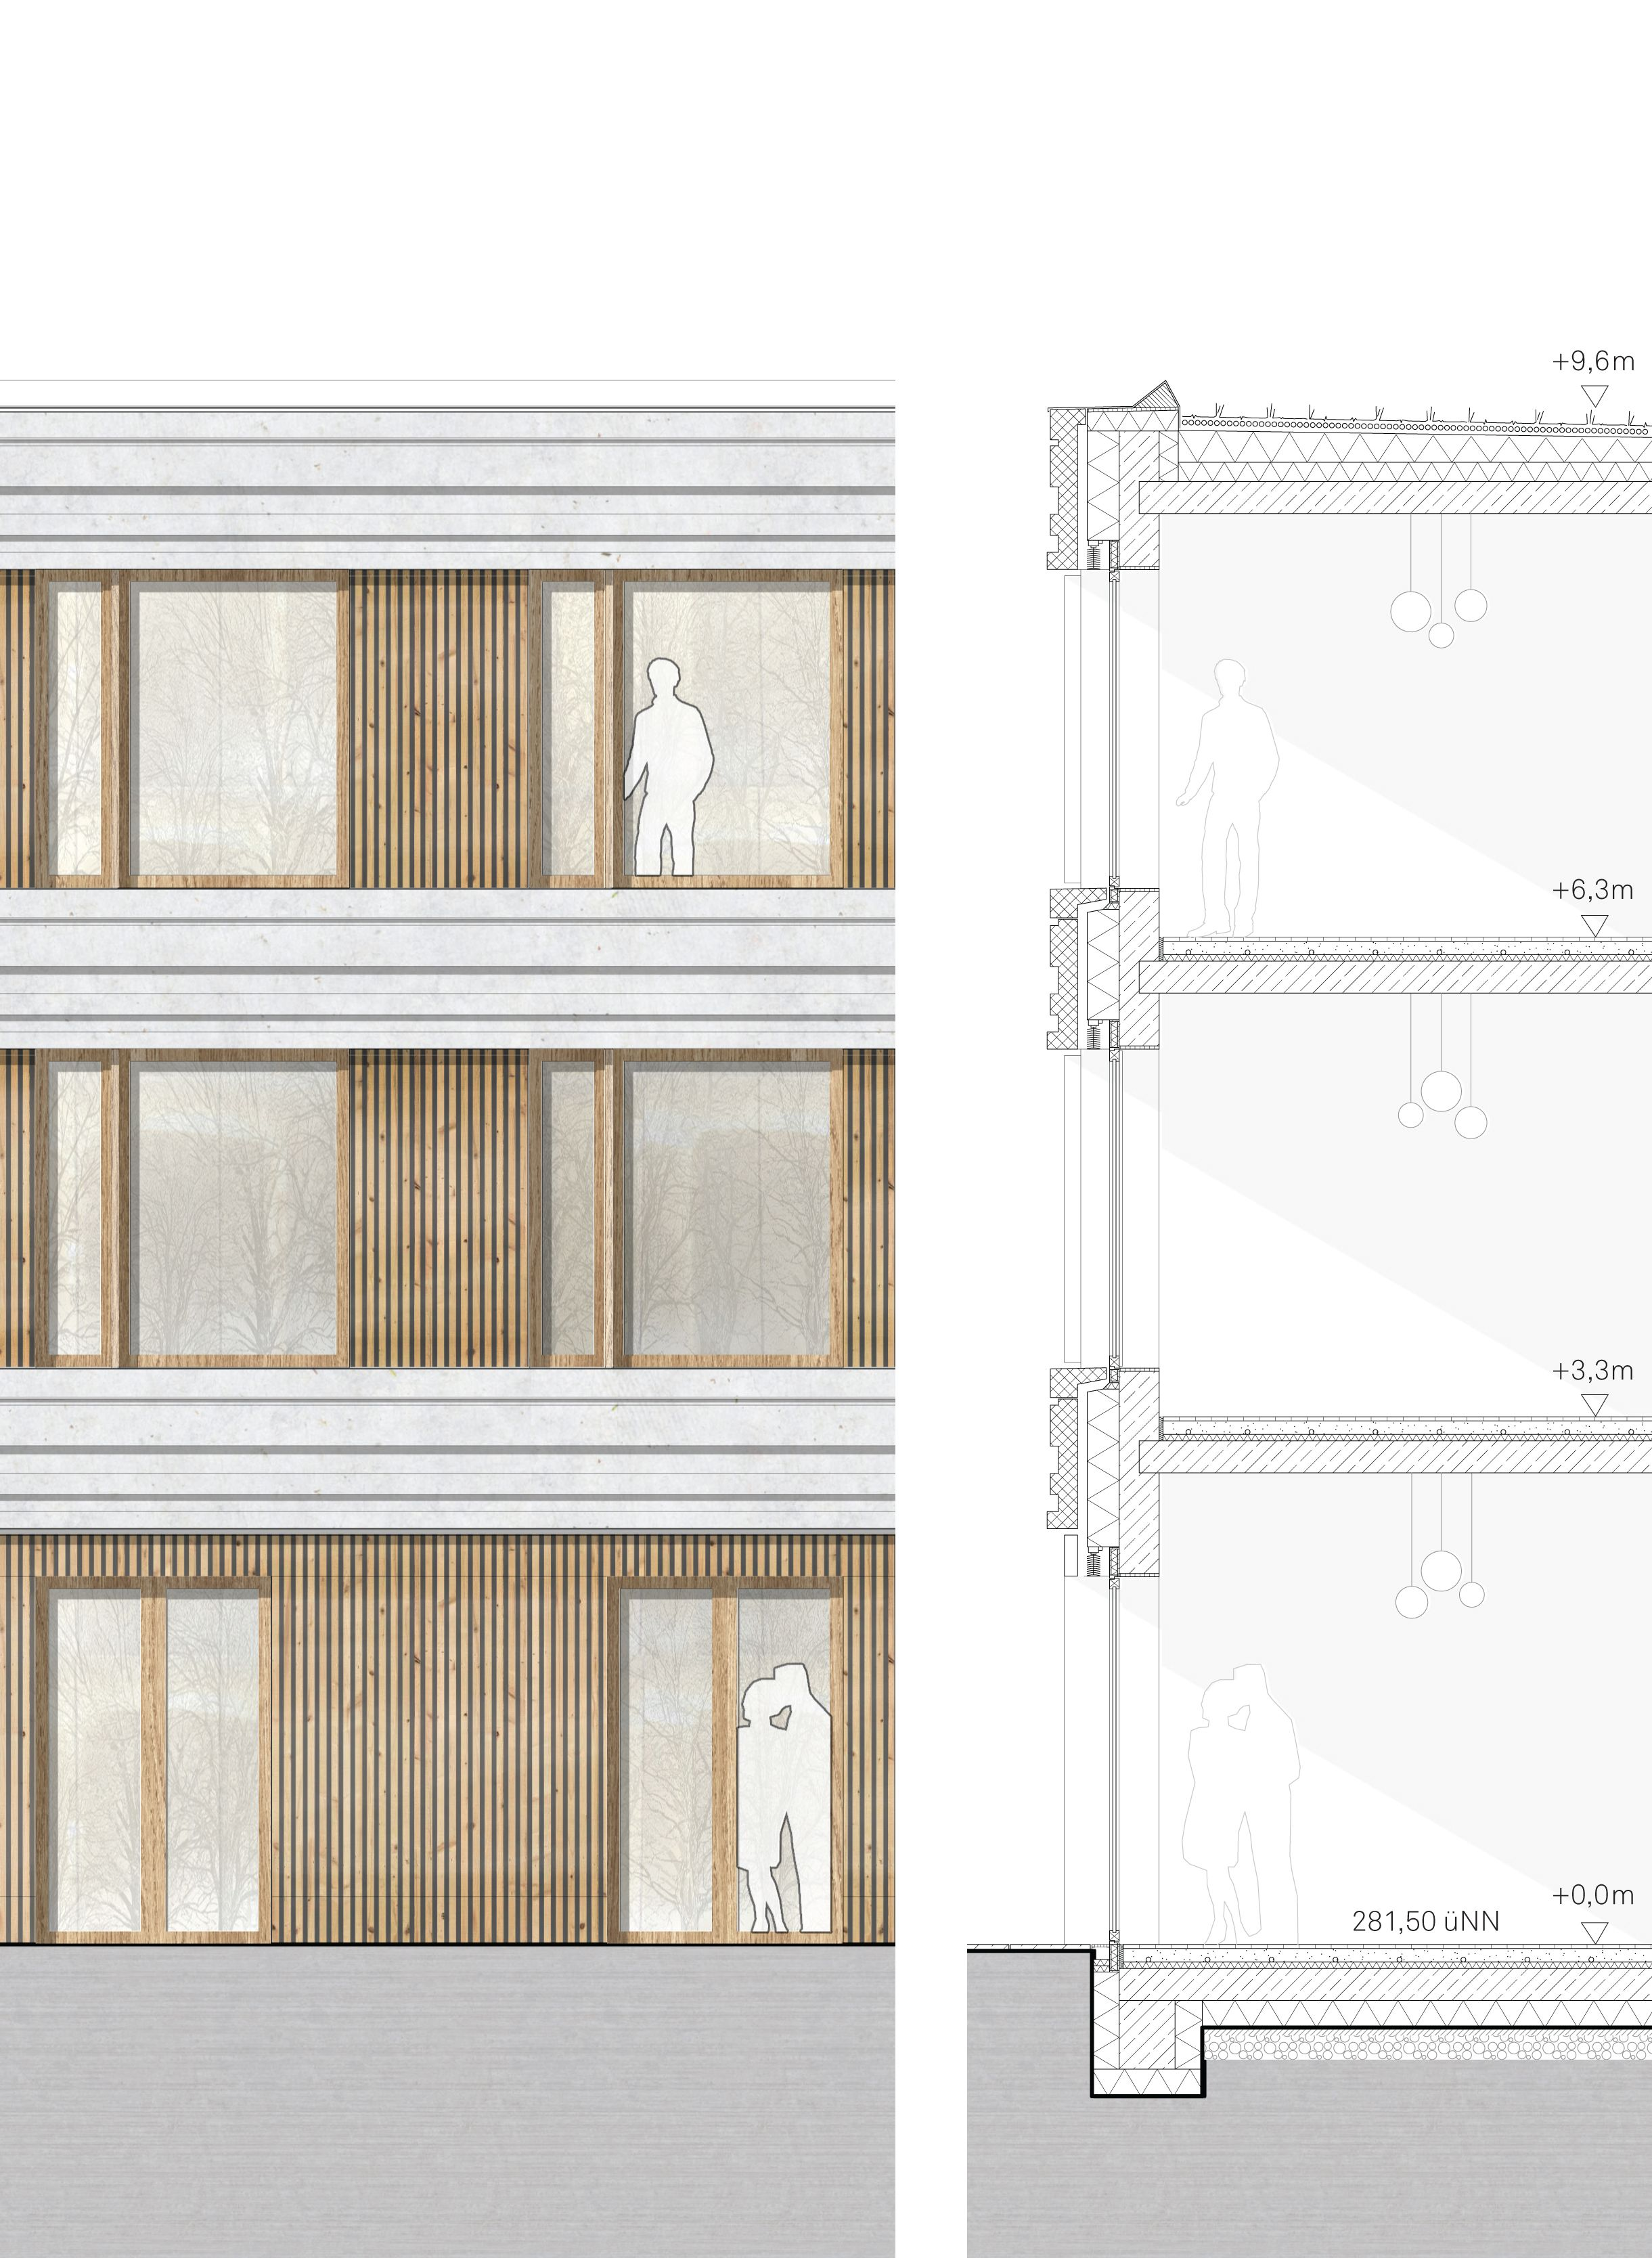 JRH — Jakob-Riedinger-Haus Würzburg #arquitectonico